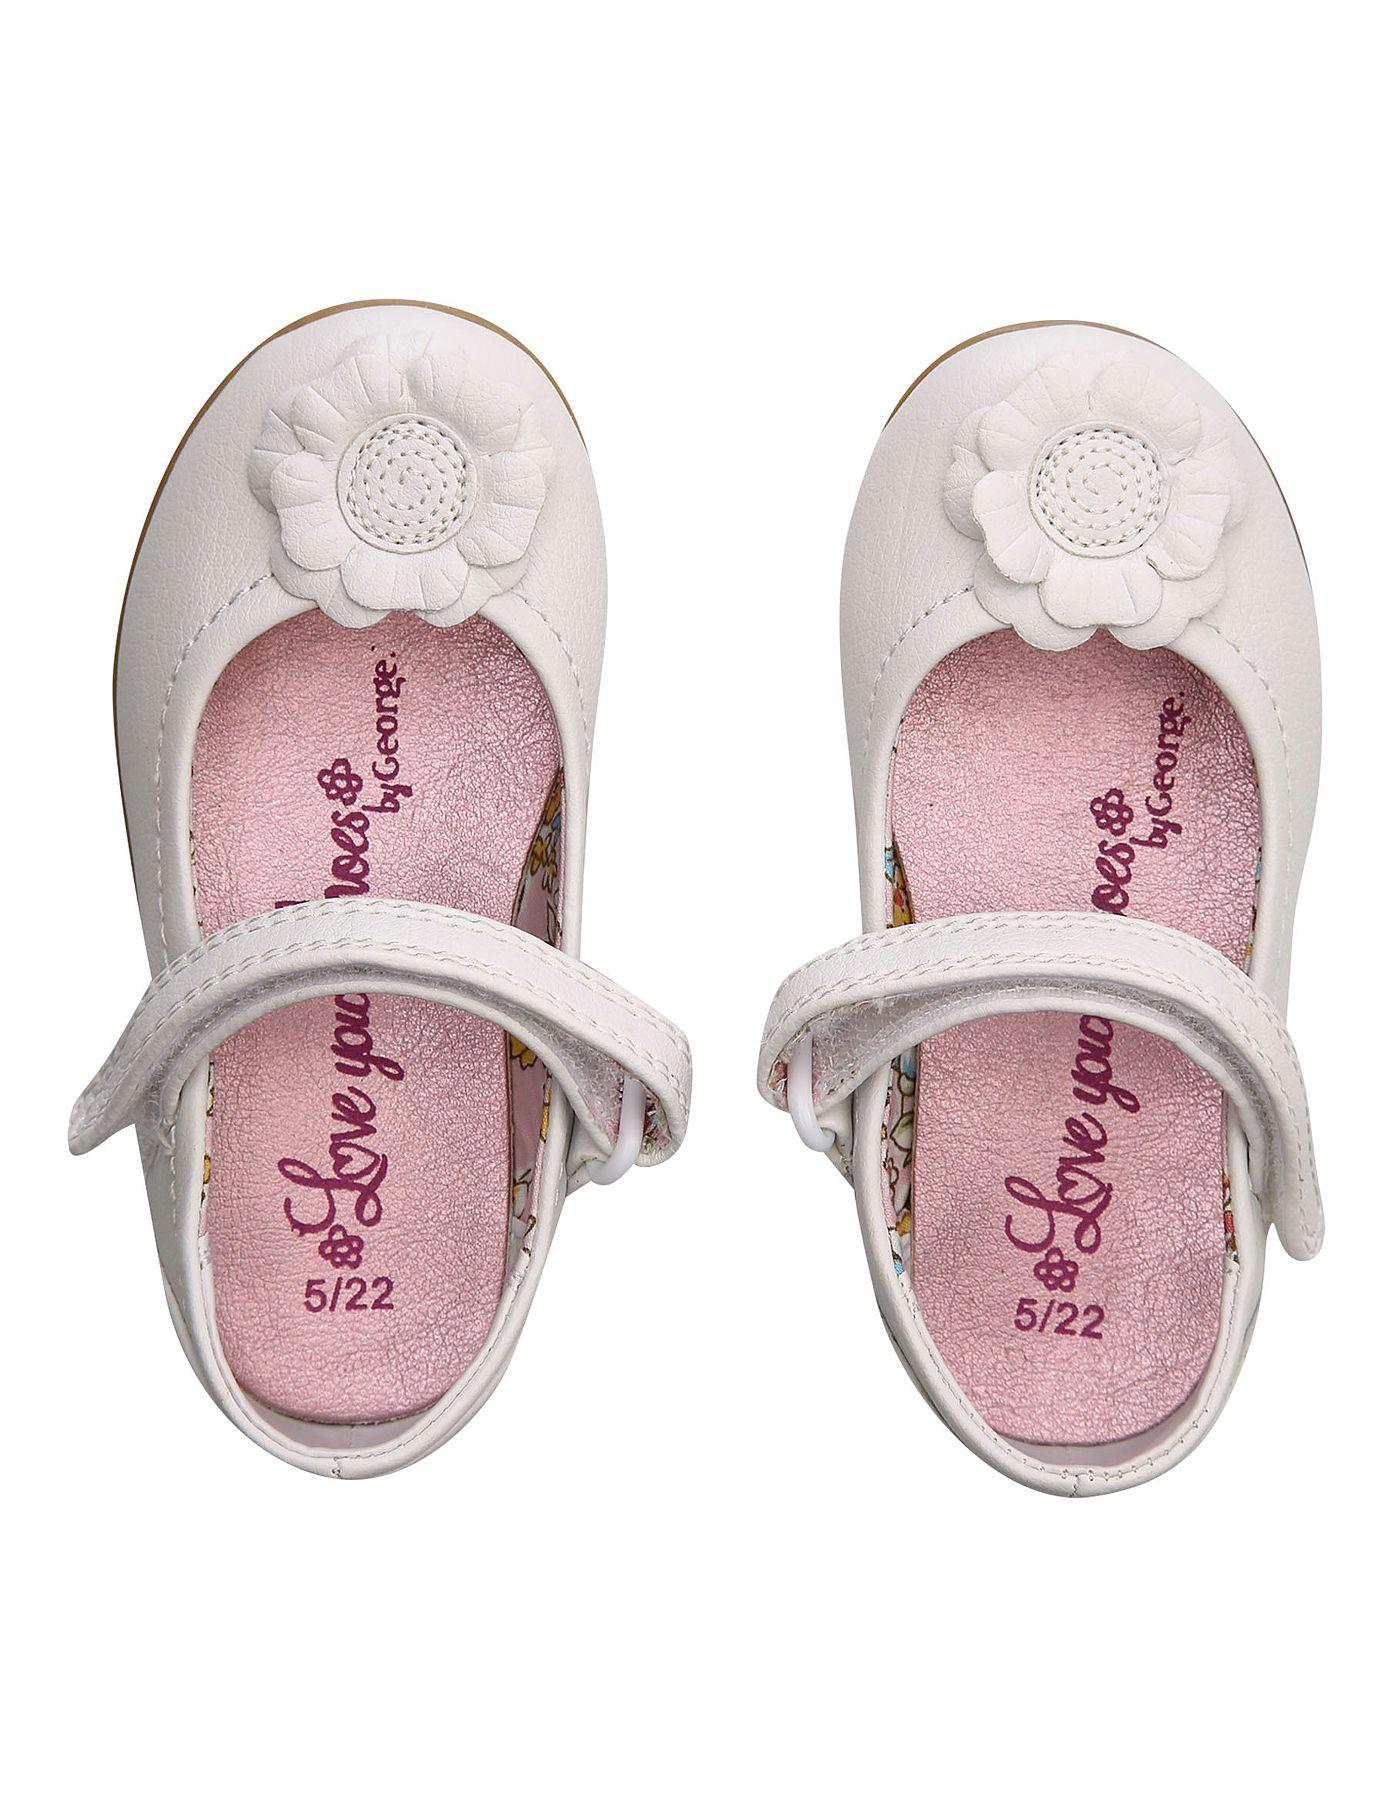 ASDA | Ballet shoes, Girls shoes, Shoes